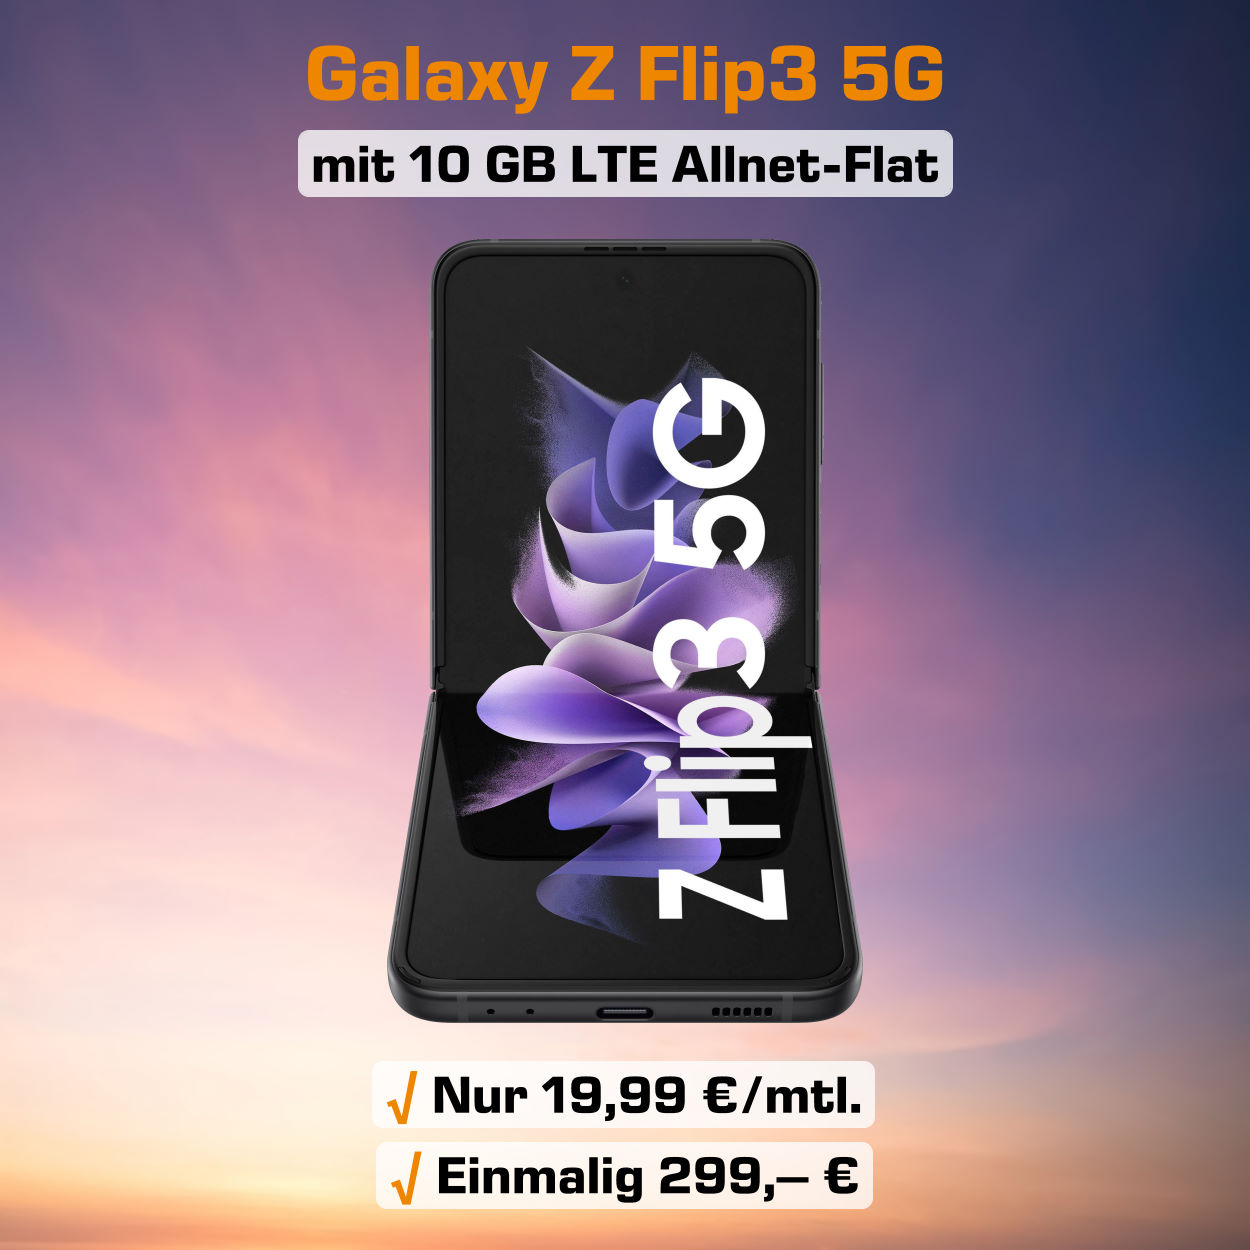 Galaxy Z Flip3 5G Handyvertrag inkl. 10 GB LTE Allnet-Flat zum absoluten Bestpreis